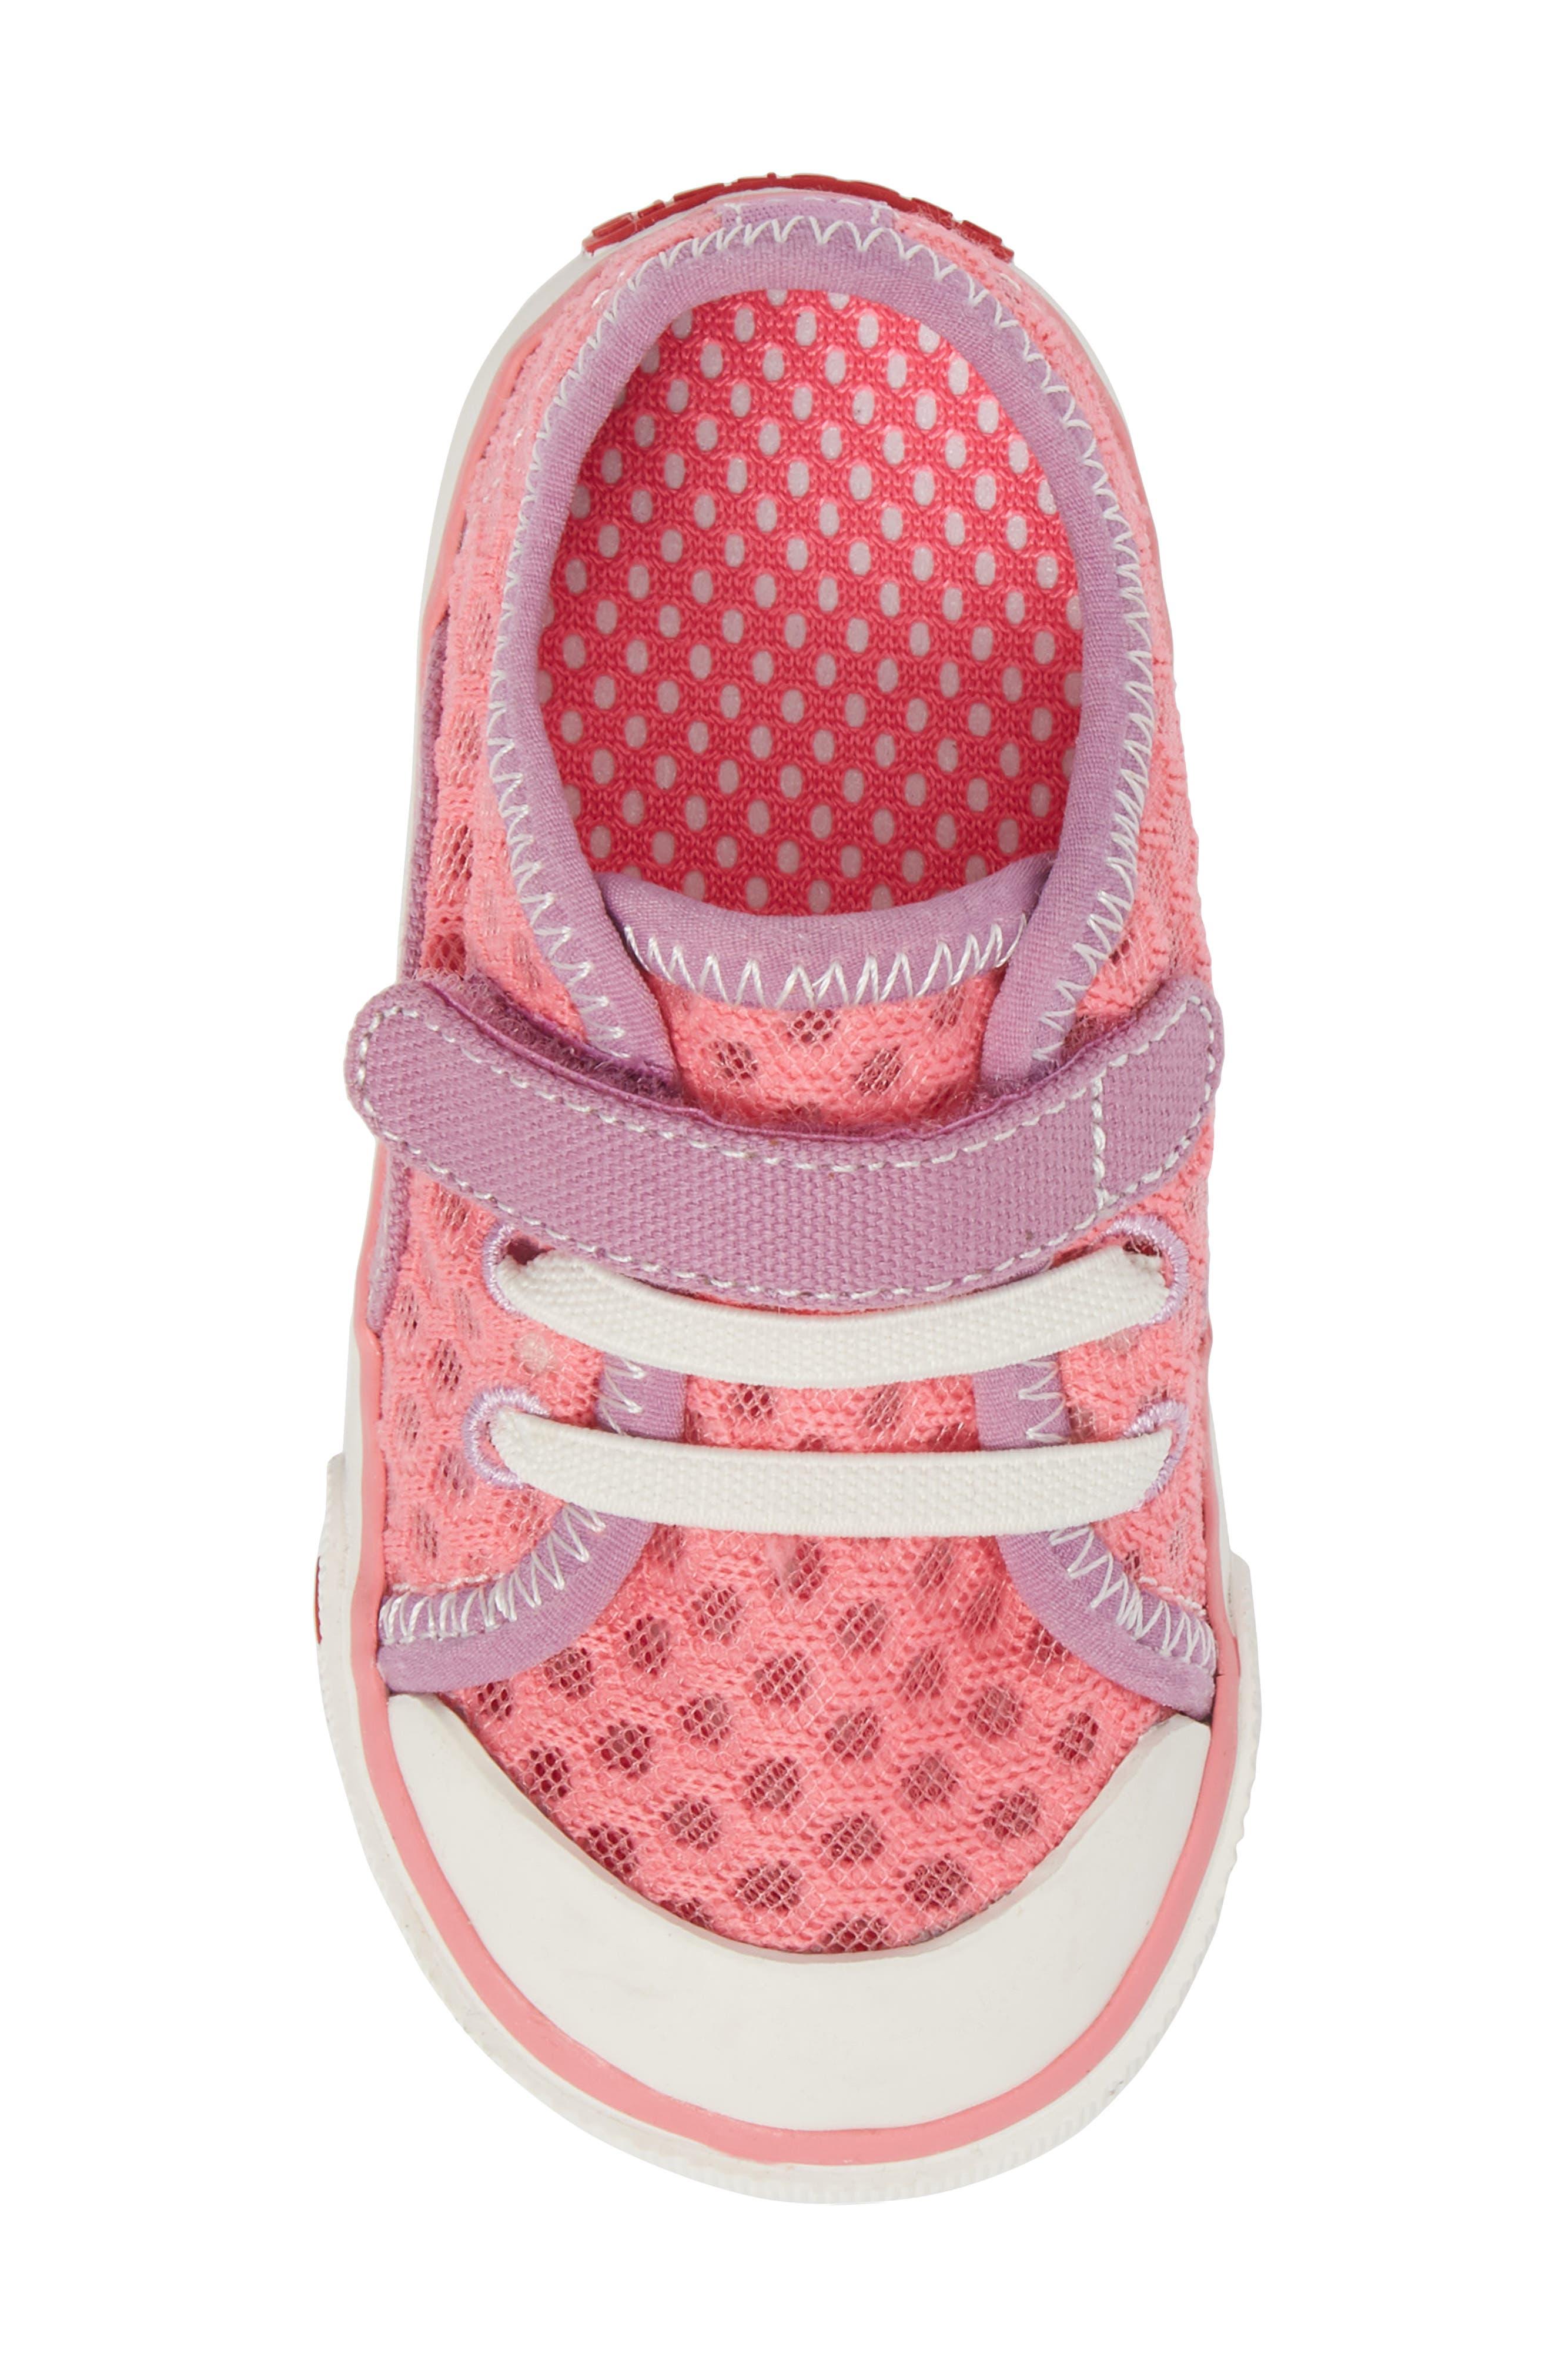 Saylor Sneaker,                             Alternate thumbnail 5, color,                             Hot Pink